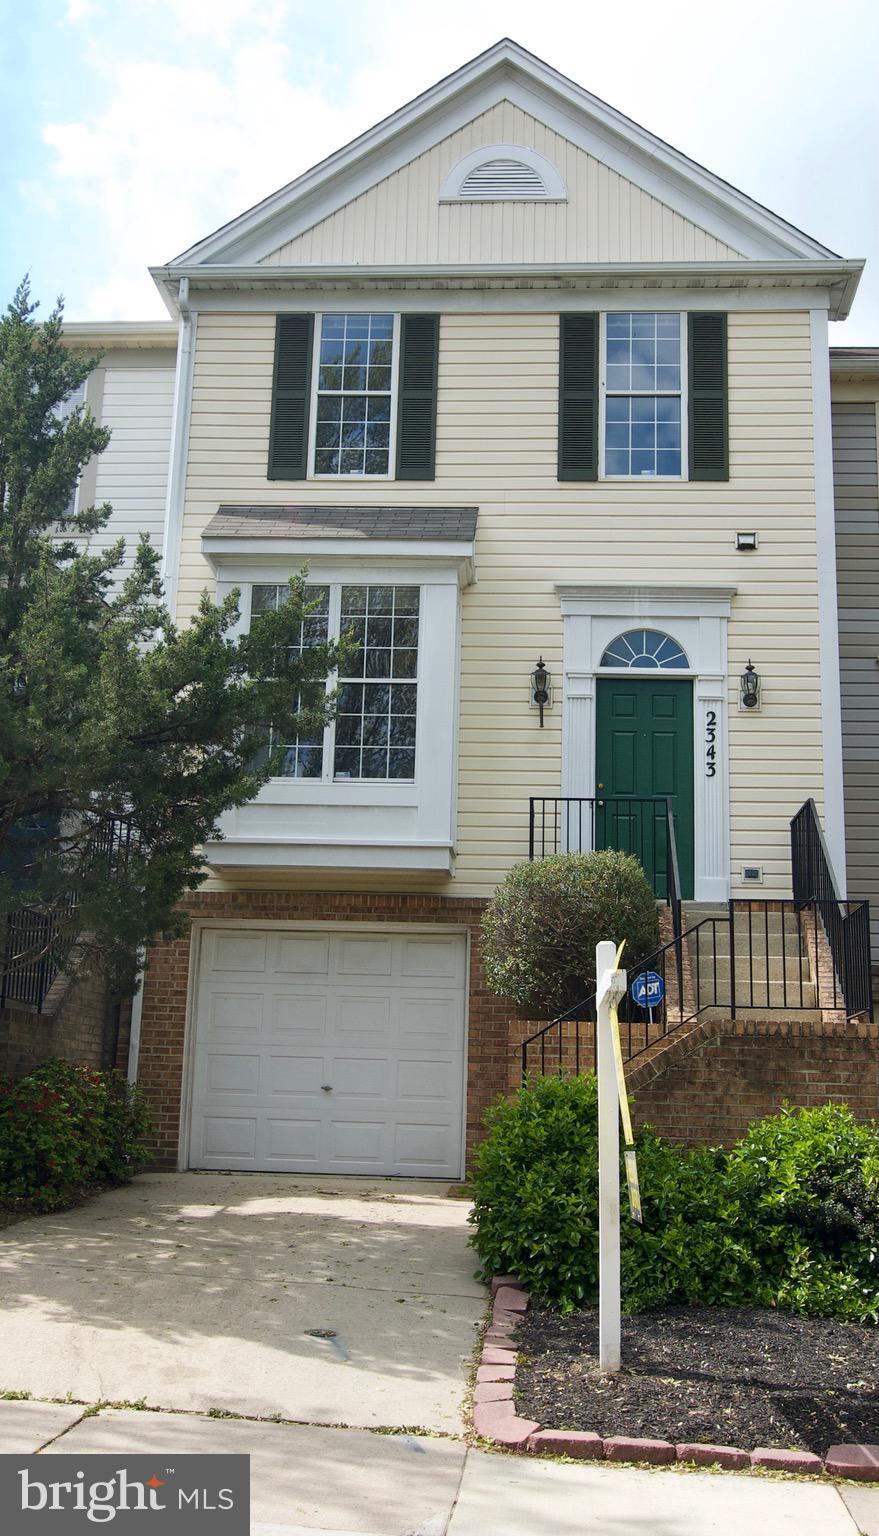 2343 MASSANUTTEN DRIVE, SILVER SPRING, Maryland 20906, 3 Bedrooms Bedrooms, ,3 BathroomsBathrooms,Townhouse,For Sale,2343 MASSANUTTEN DRIVE,MDMC755082